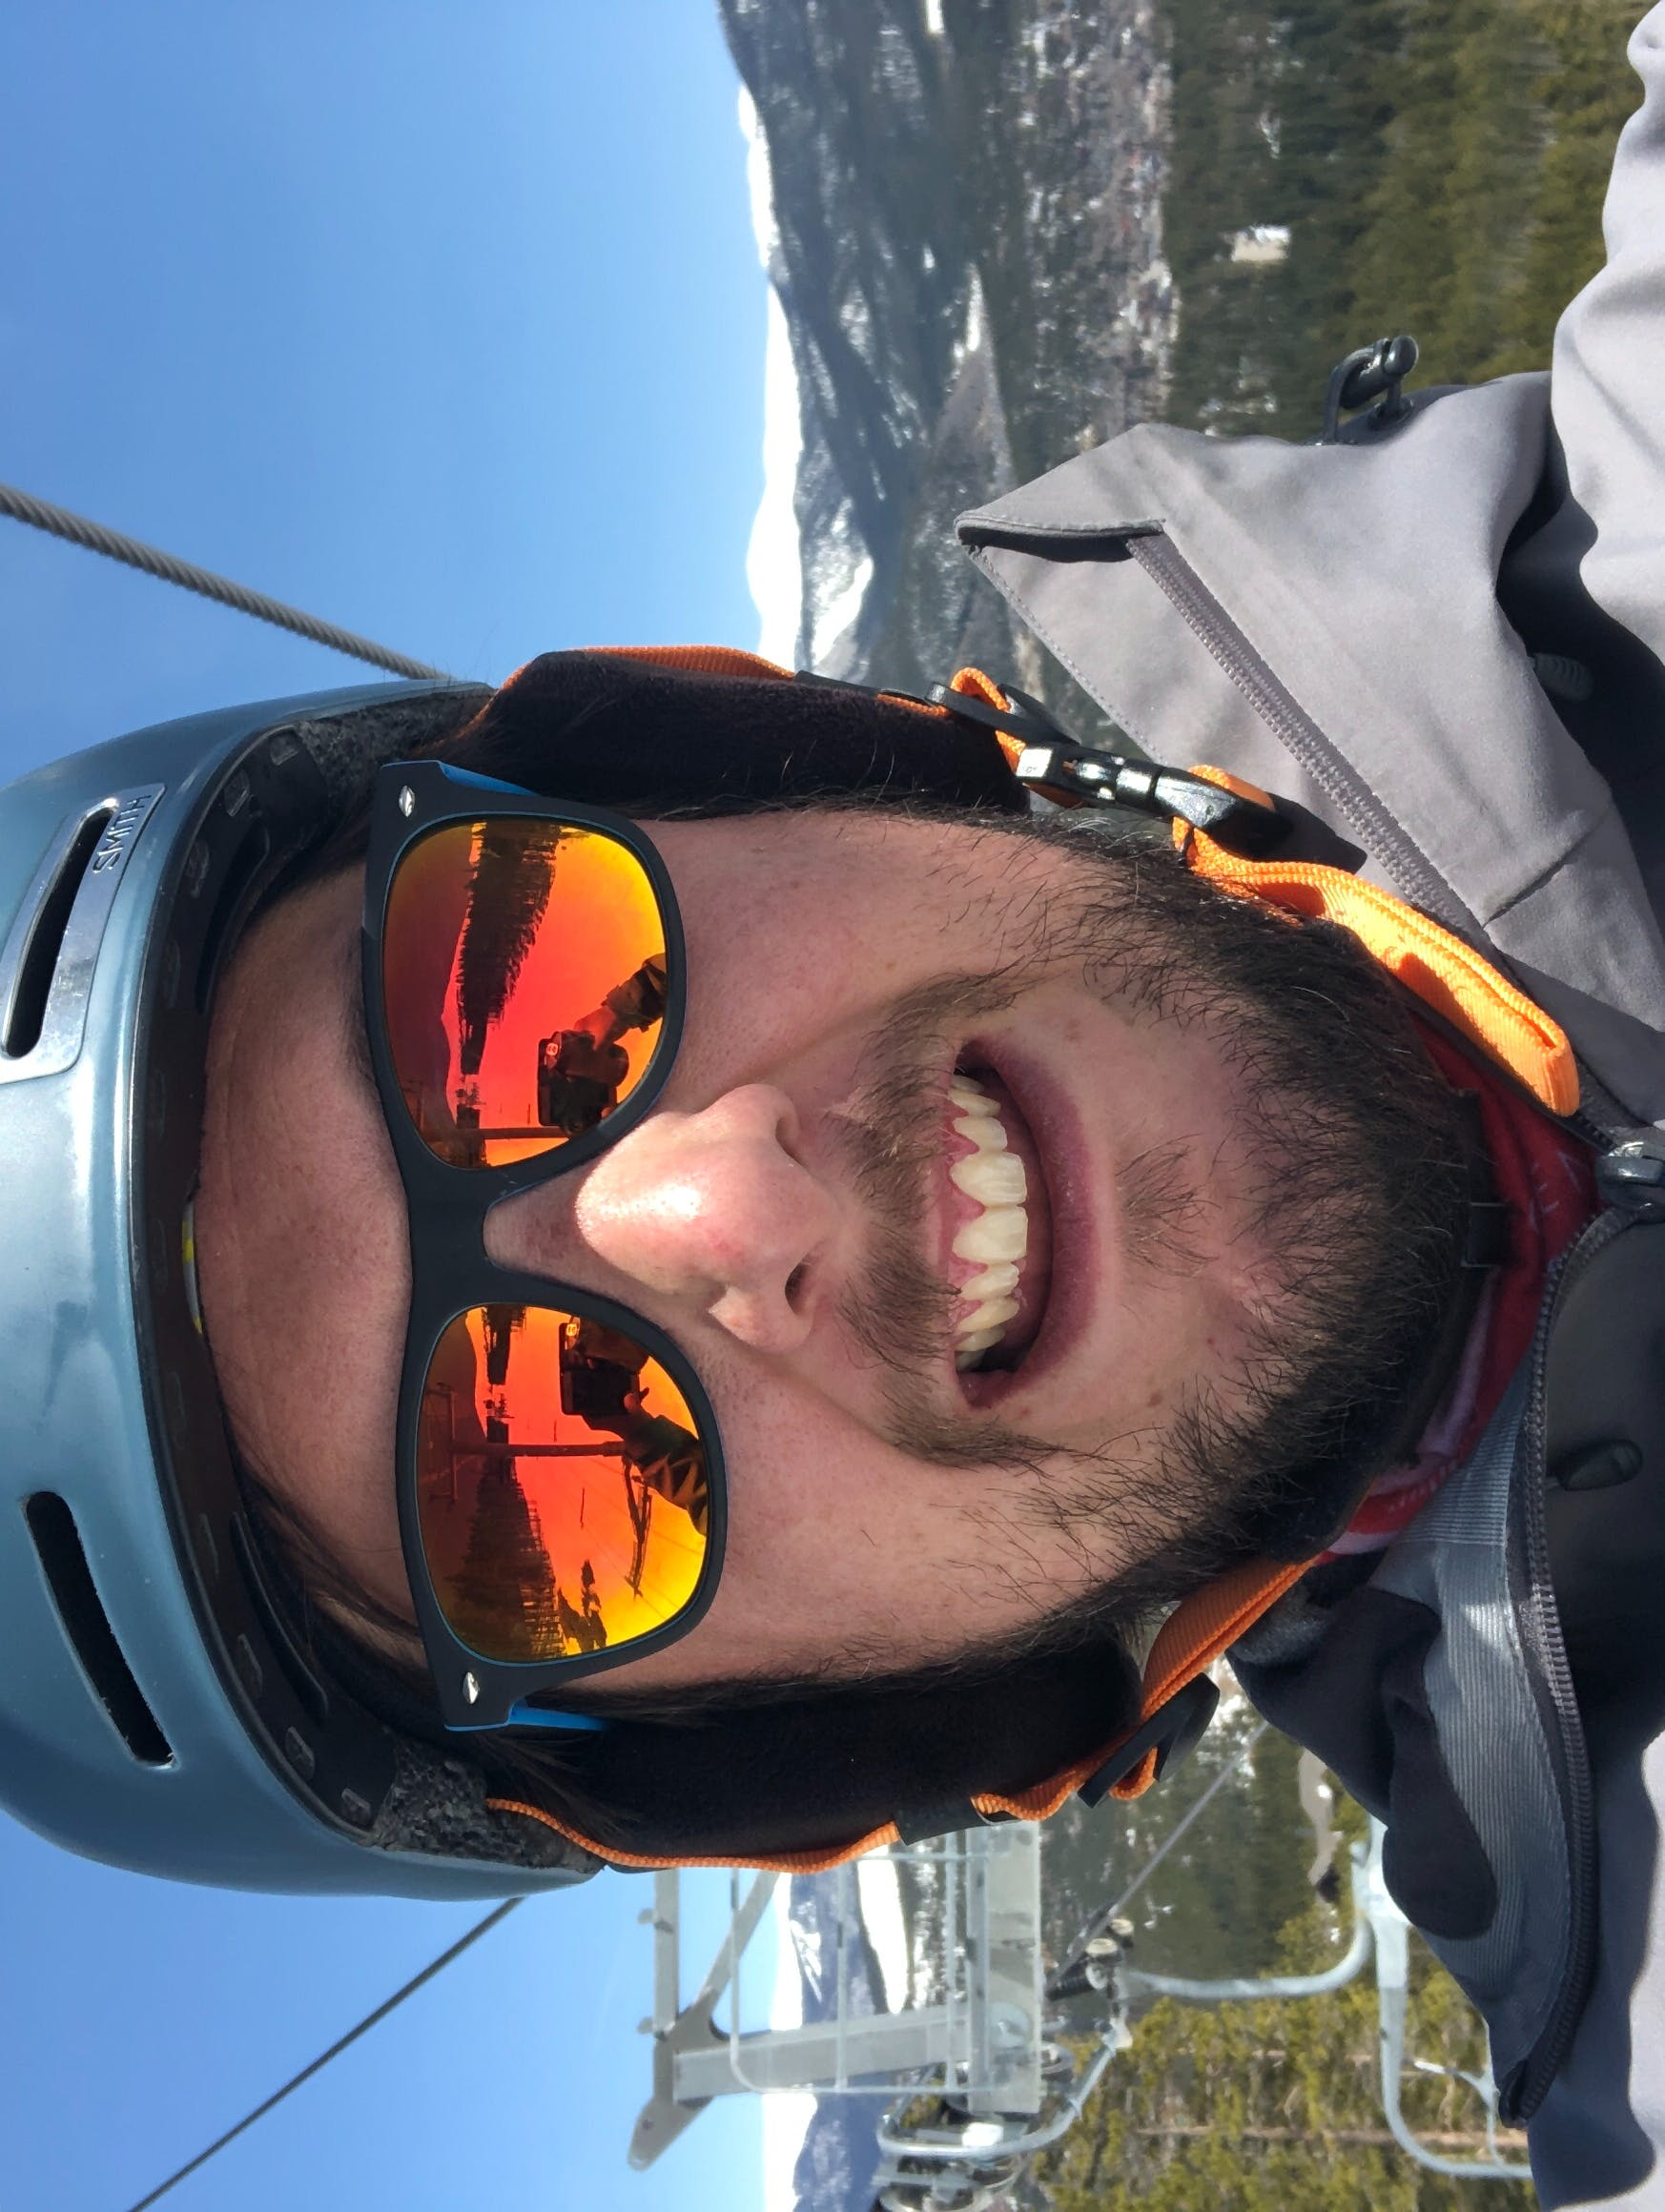 Winter Sports Expert Patrick Graham